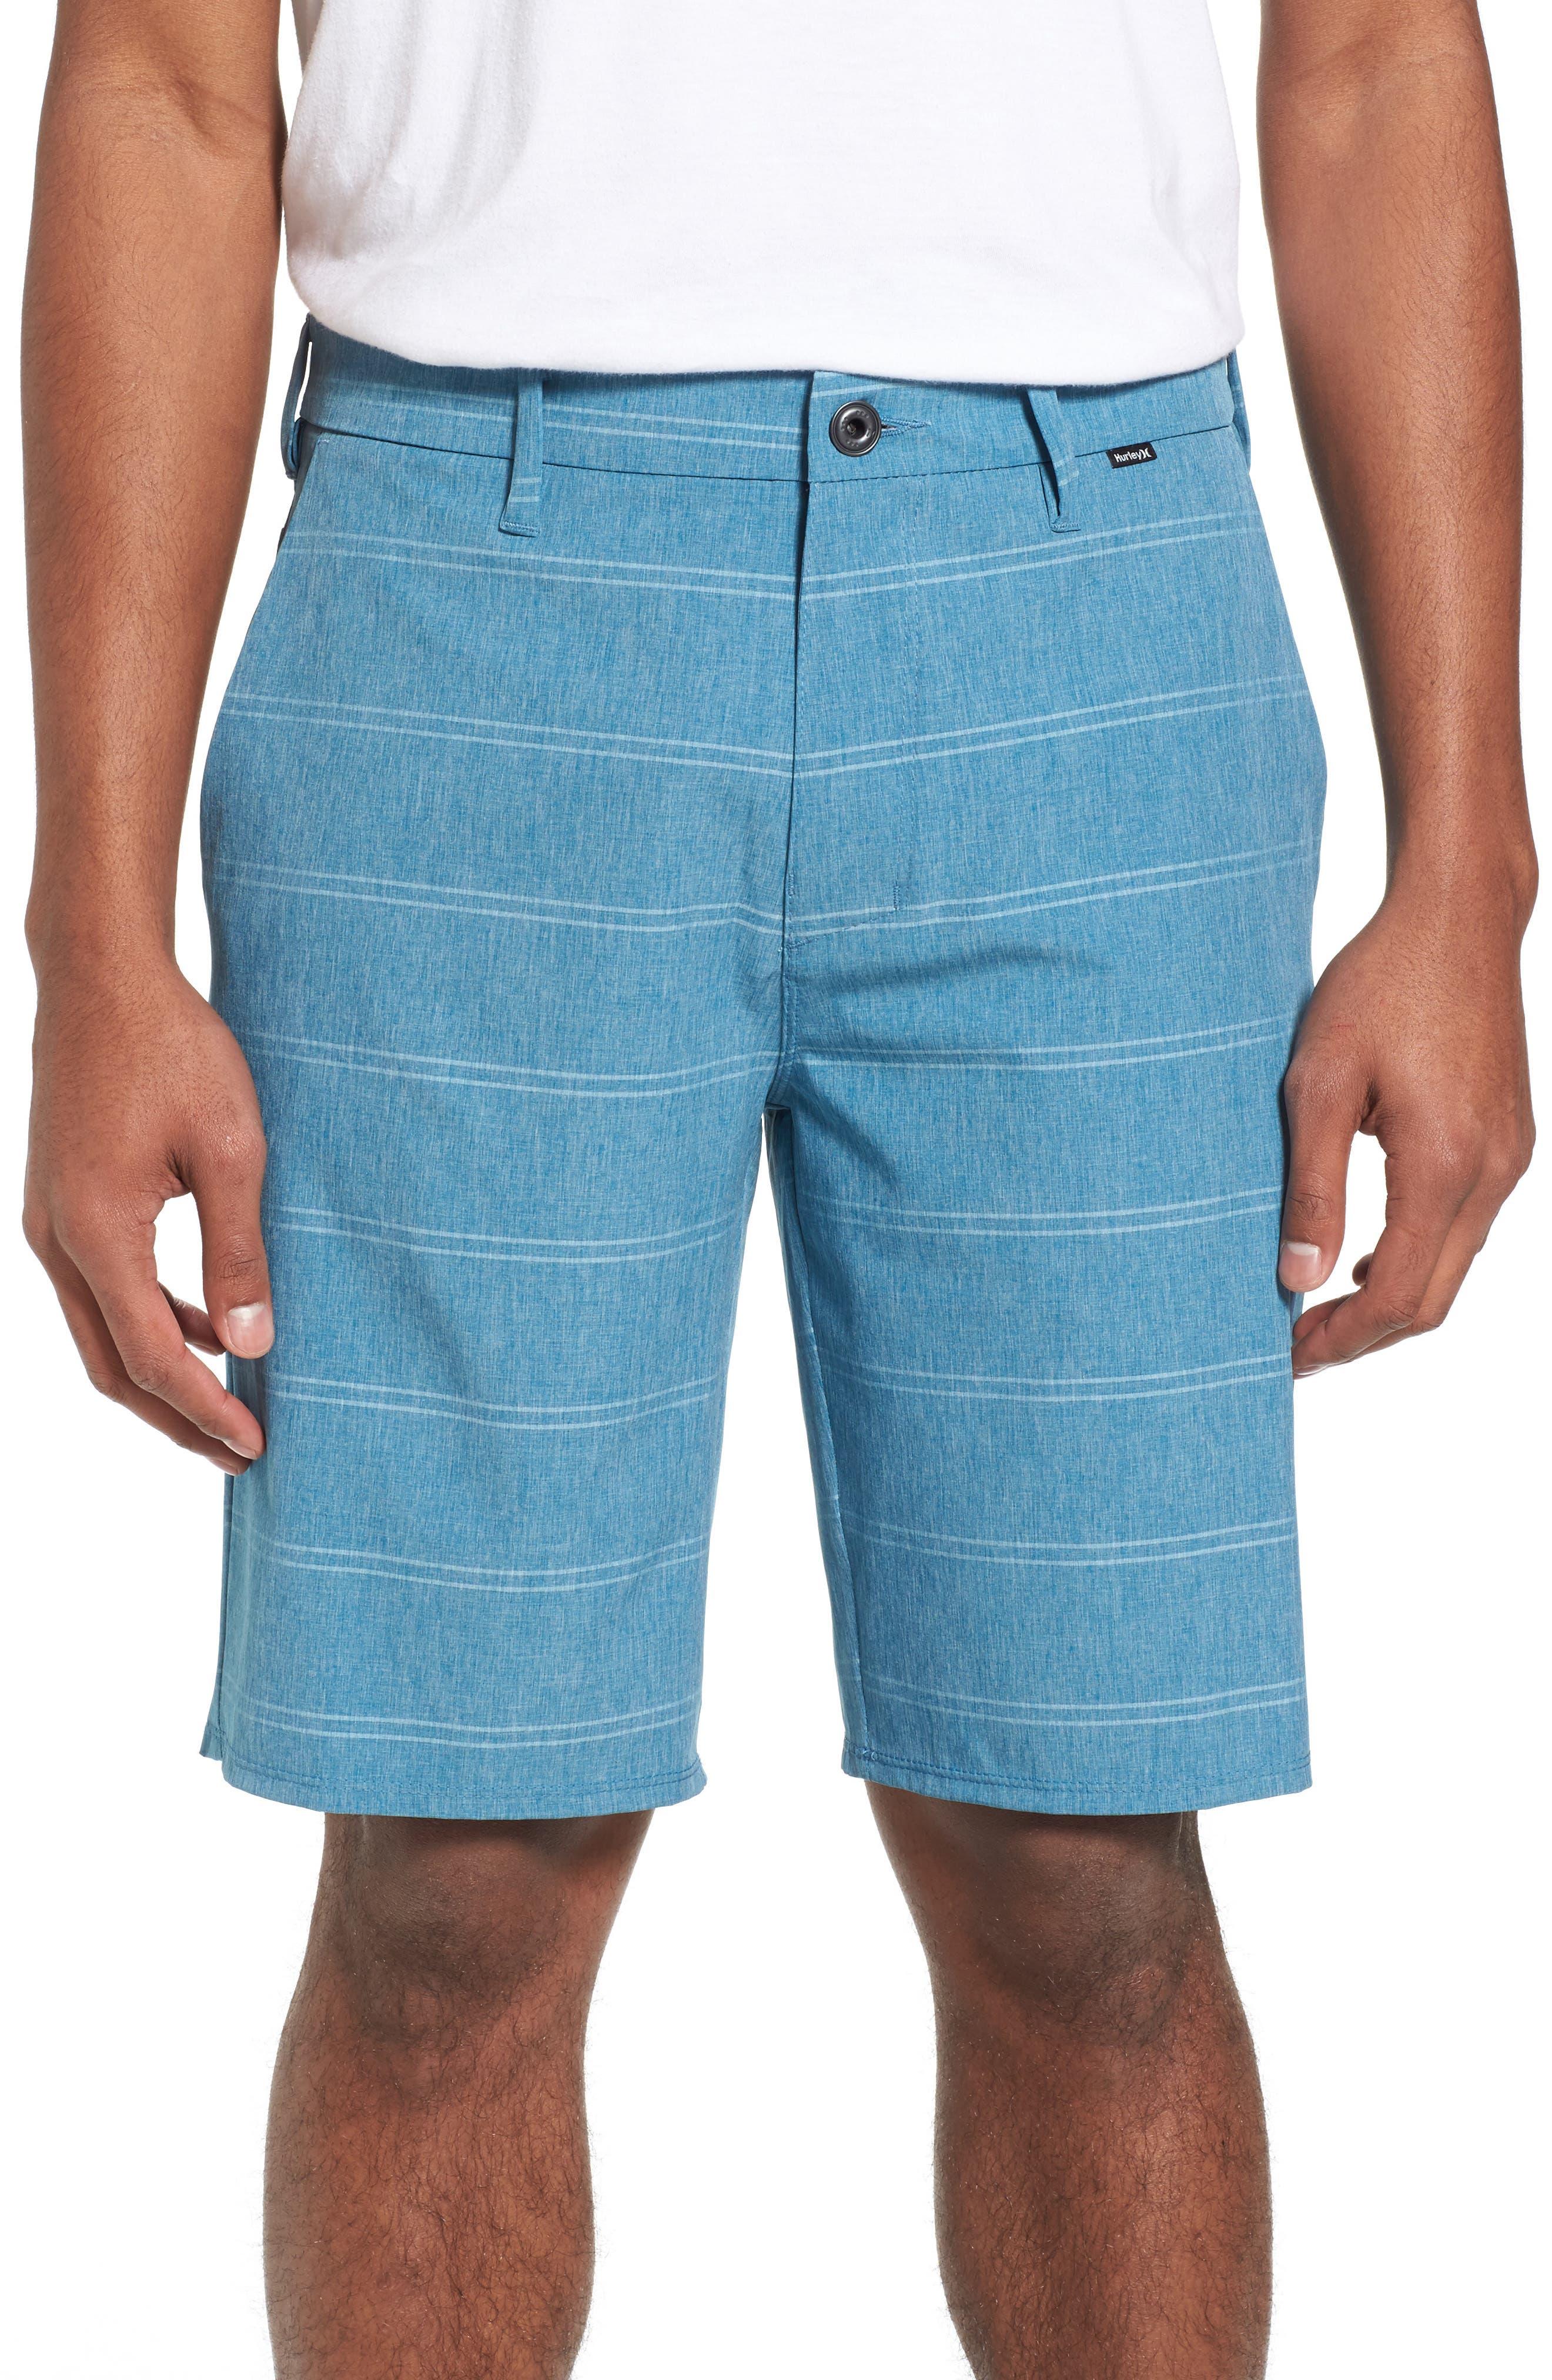 Phantom Hybrid Shorts,                             Main thumbnail 1, color,                             Space Blue